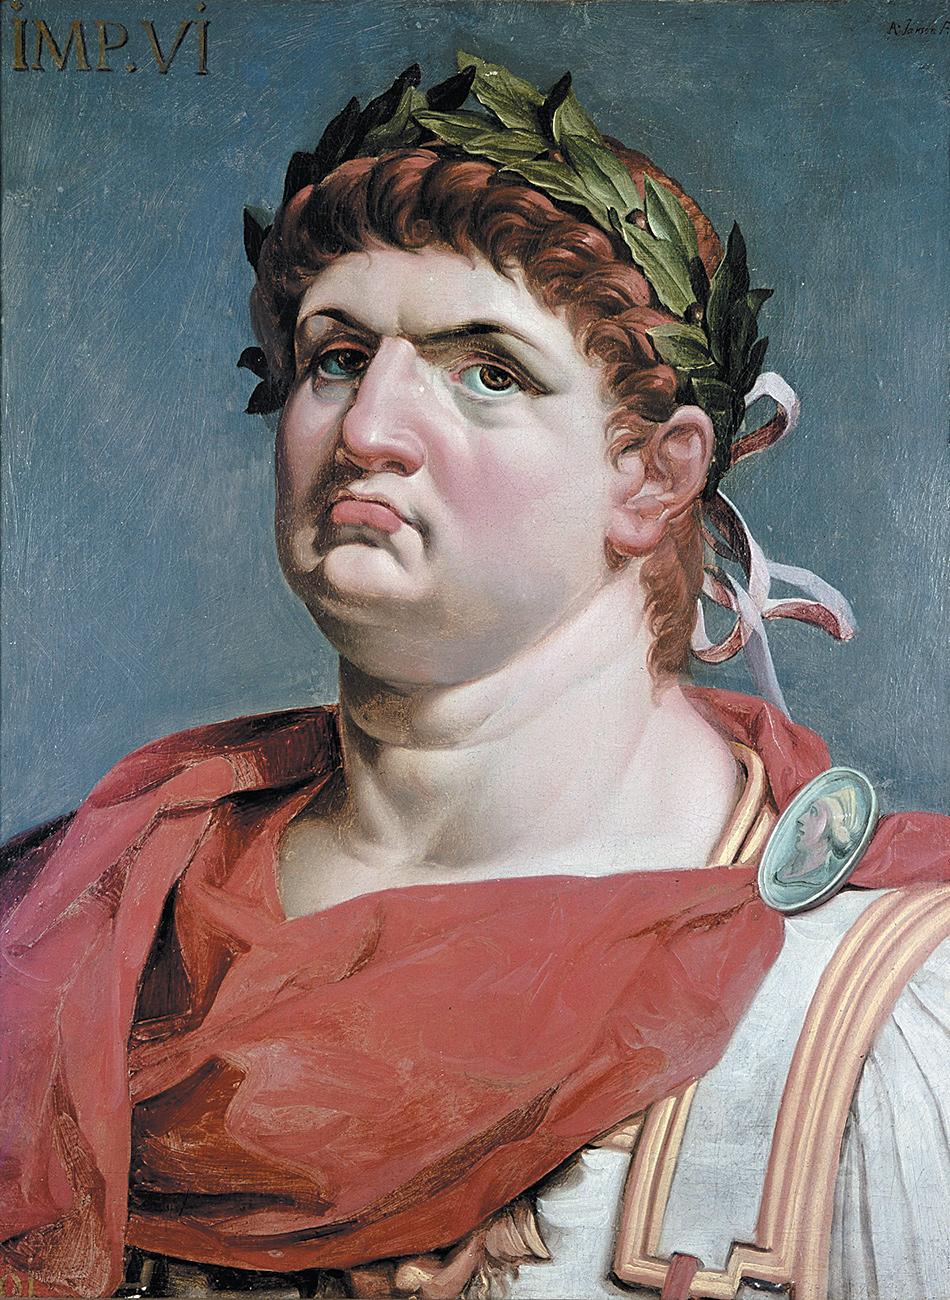 Emperor Nero; painting by Abraham Janssens, 1618